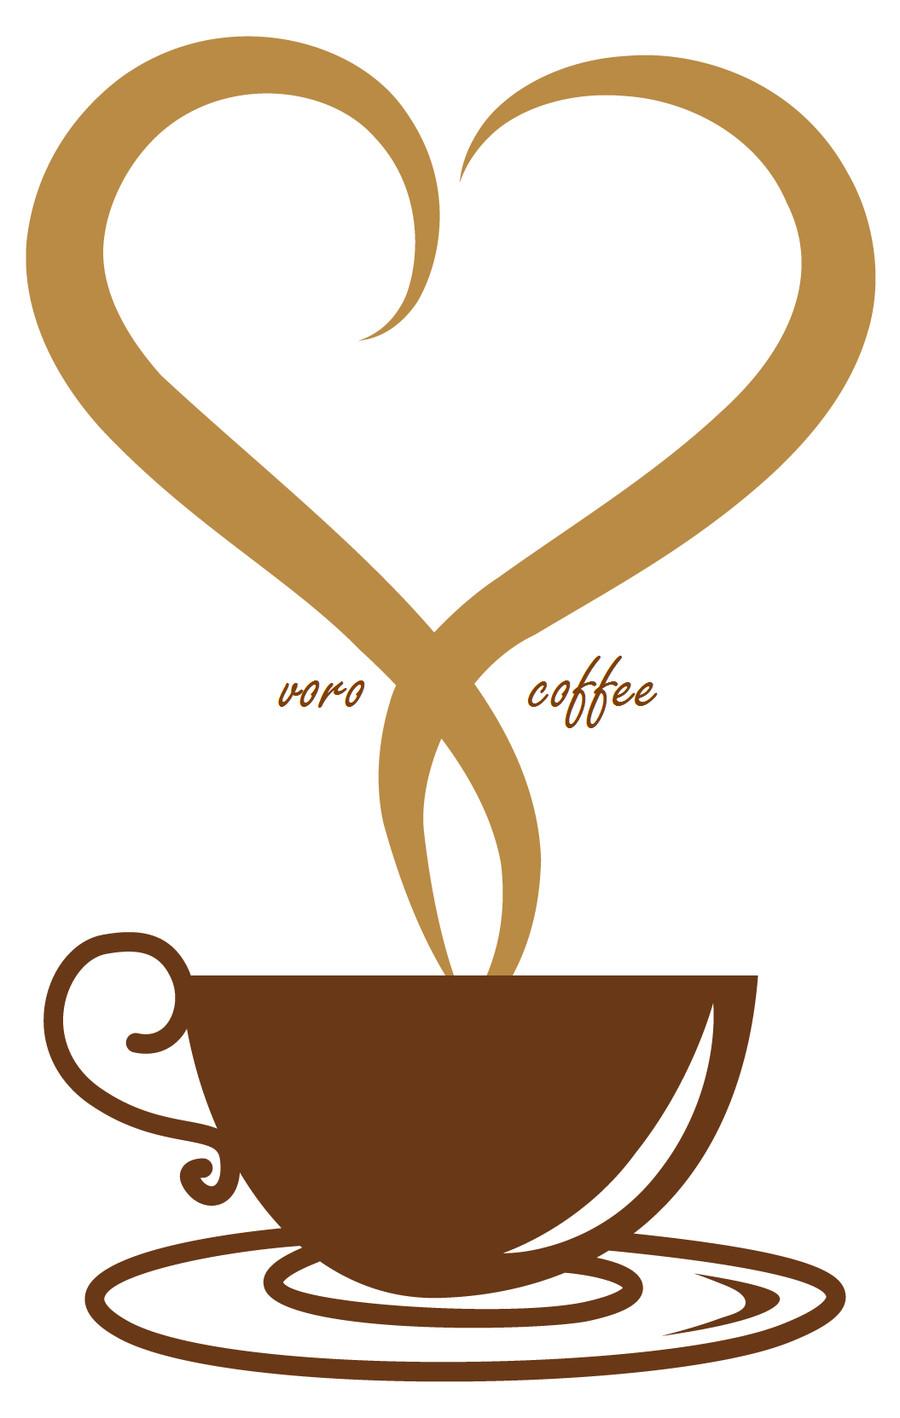 Dutch coffee logo and label.